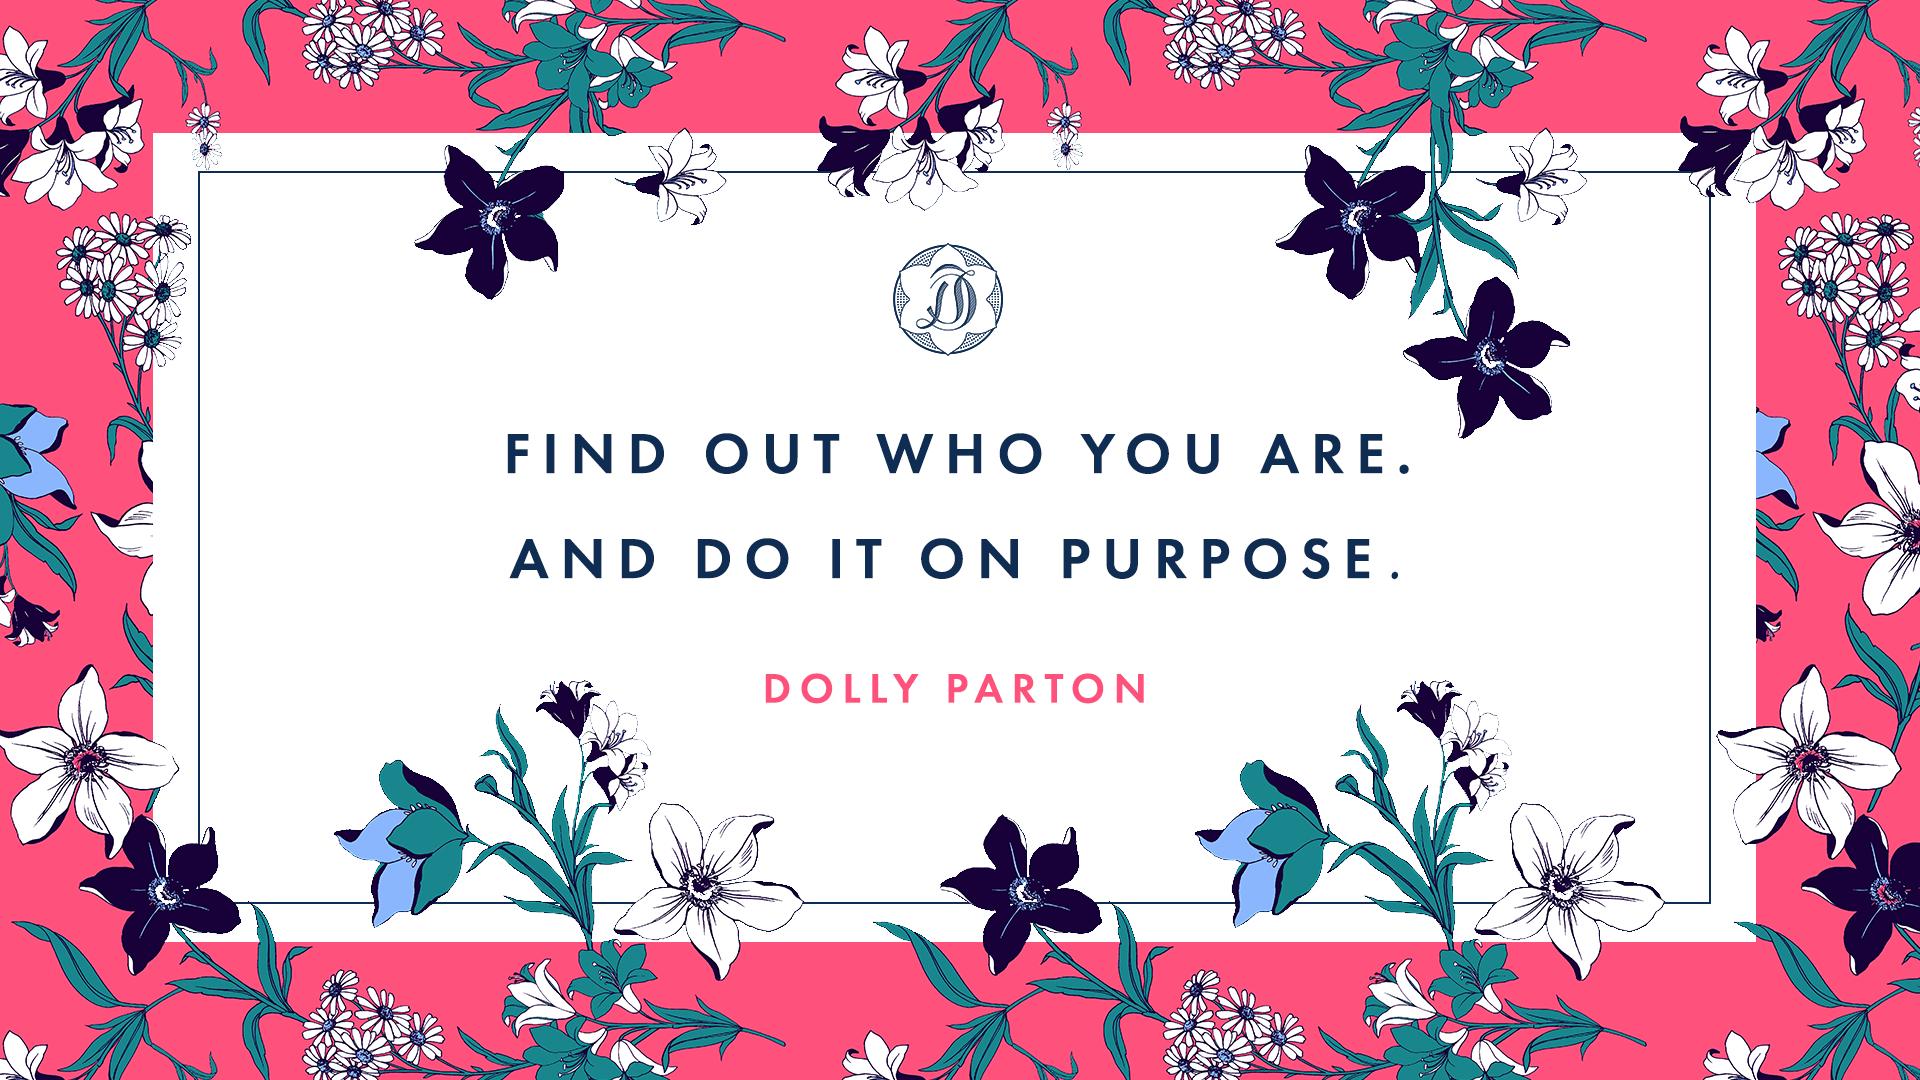 Happy Birthday Dolly Parton Free Dolly Parton Digital